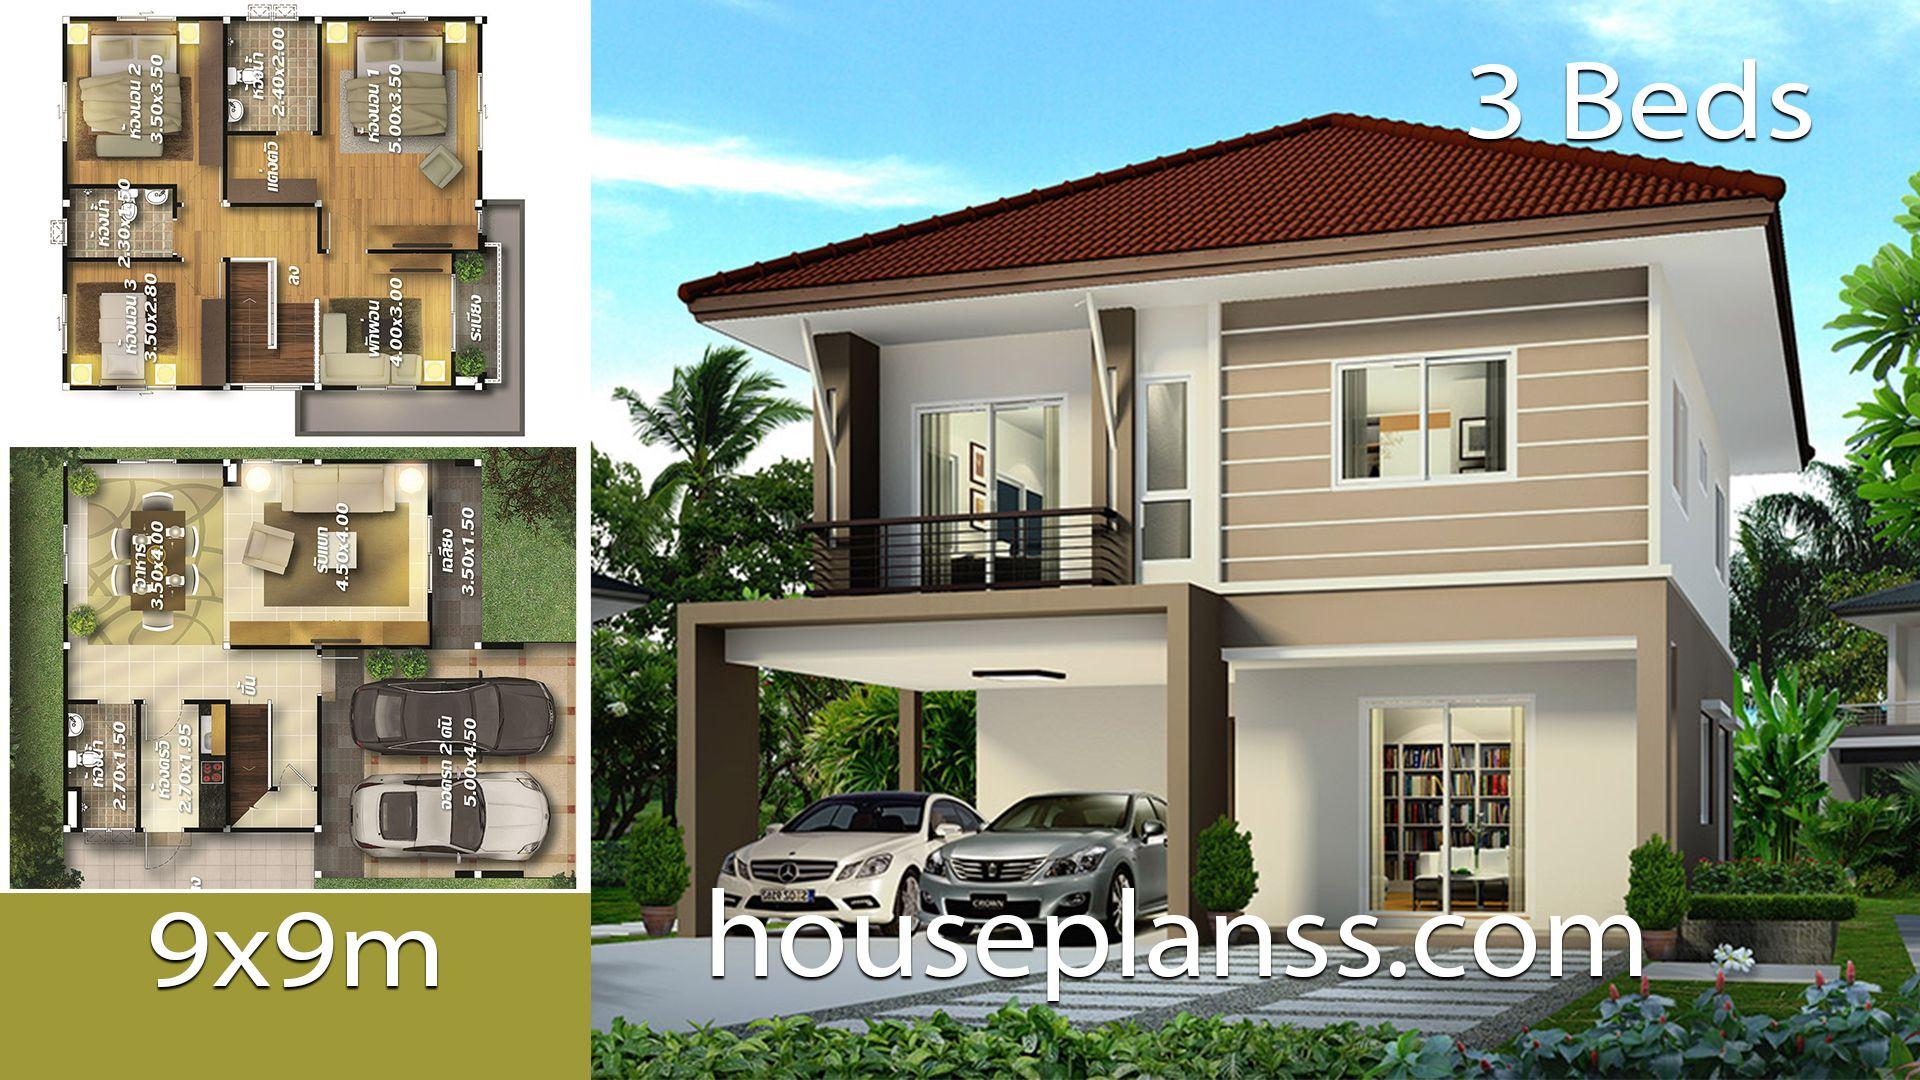 House Plans Idea 9x10 With 3 Bedrooms House Plans 3d In 2020 Home Design Plans House Design Bedroom House Plans